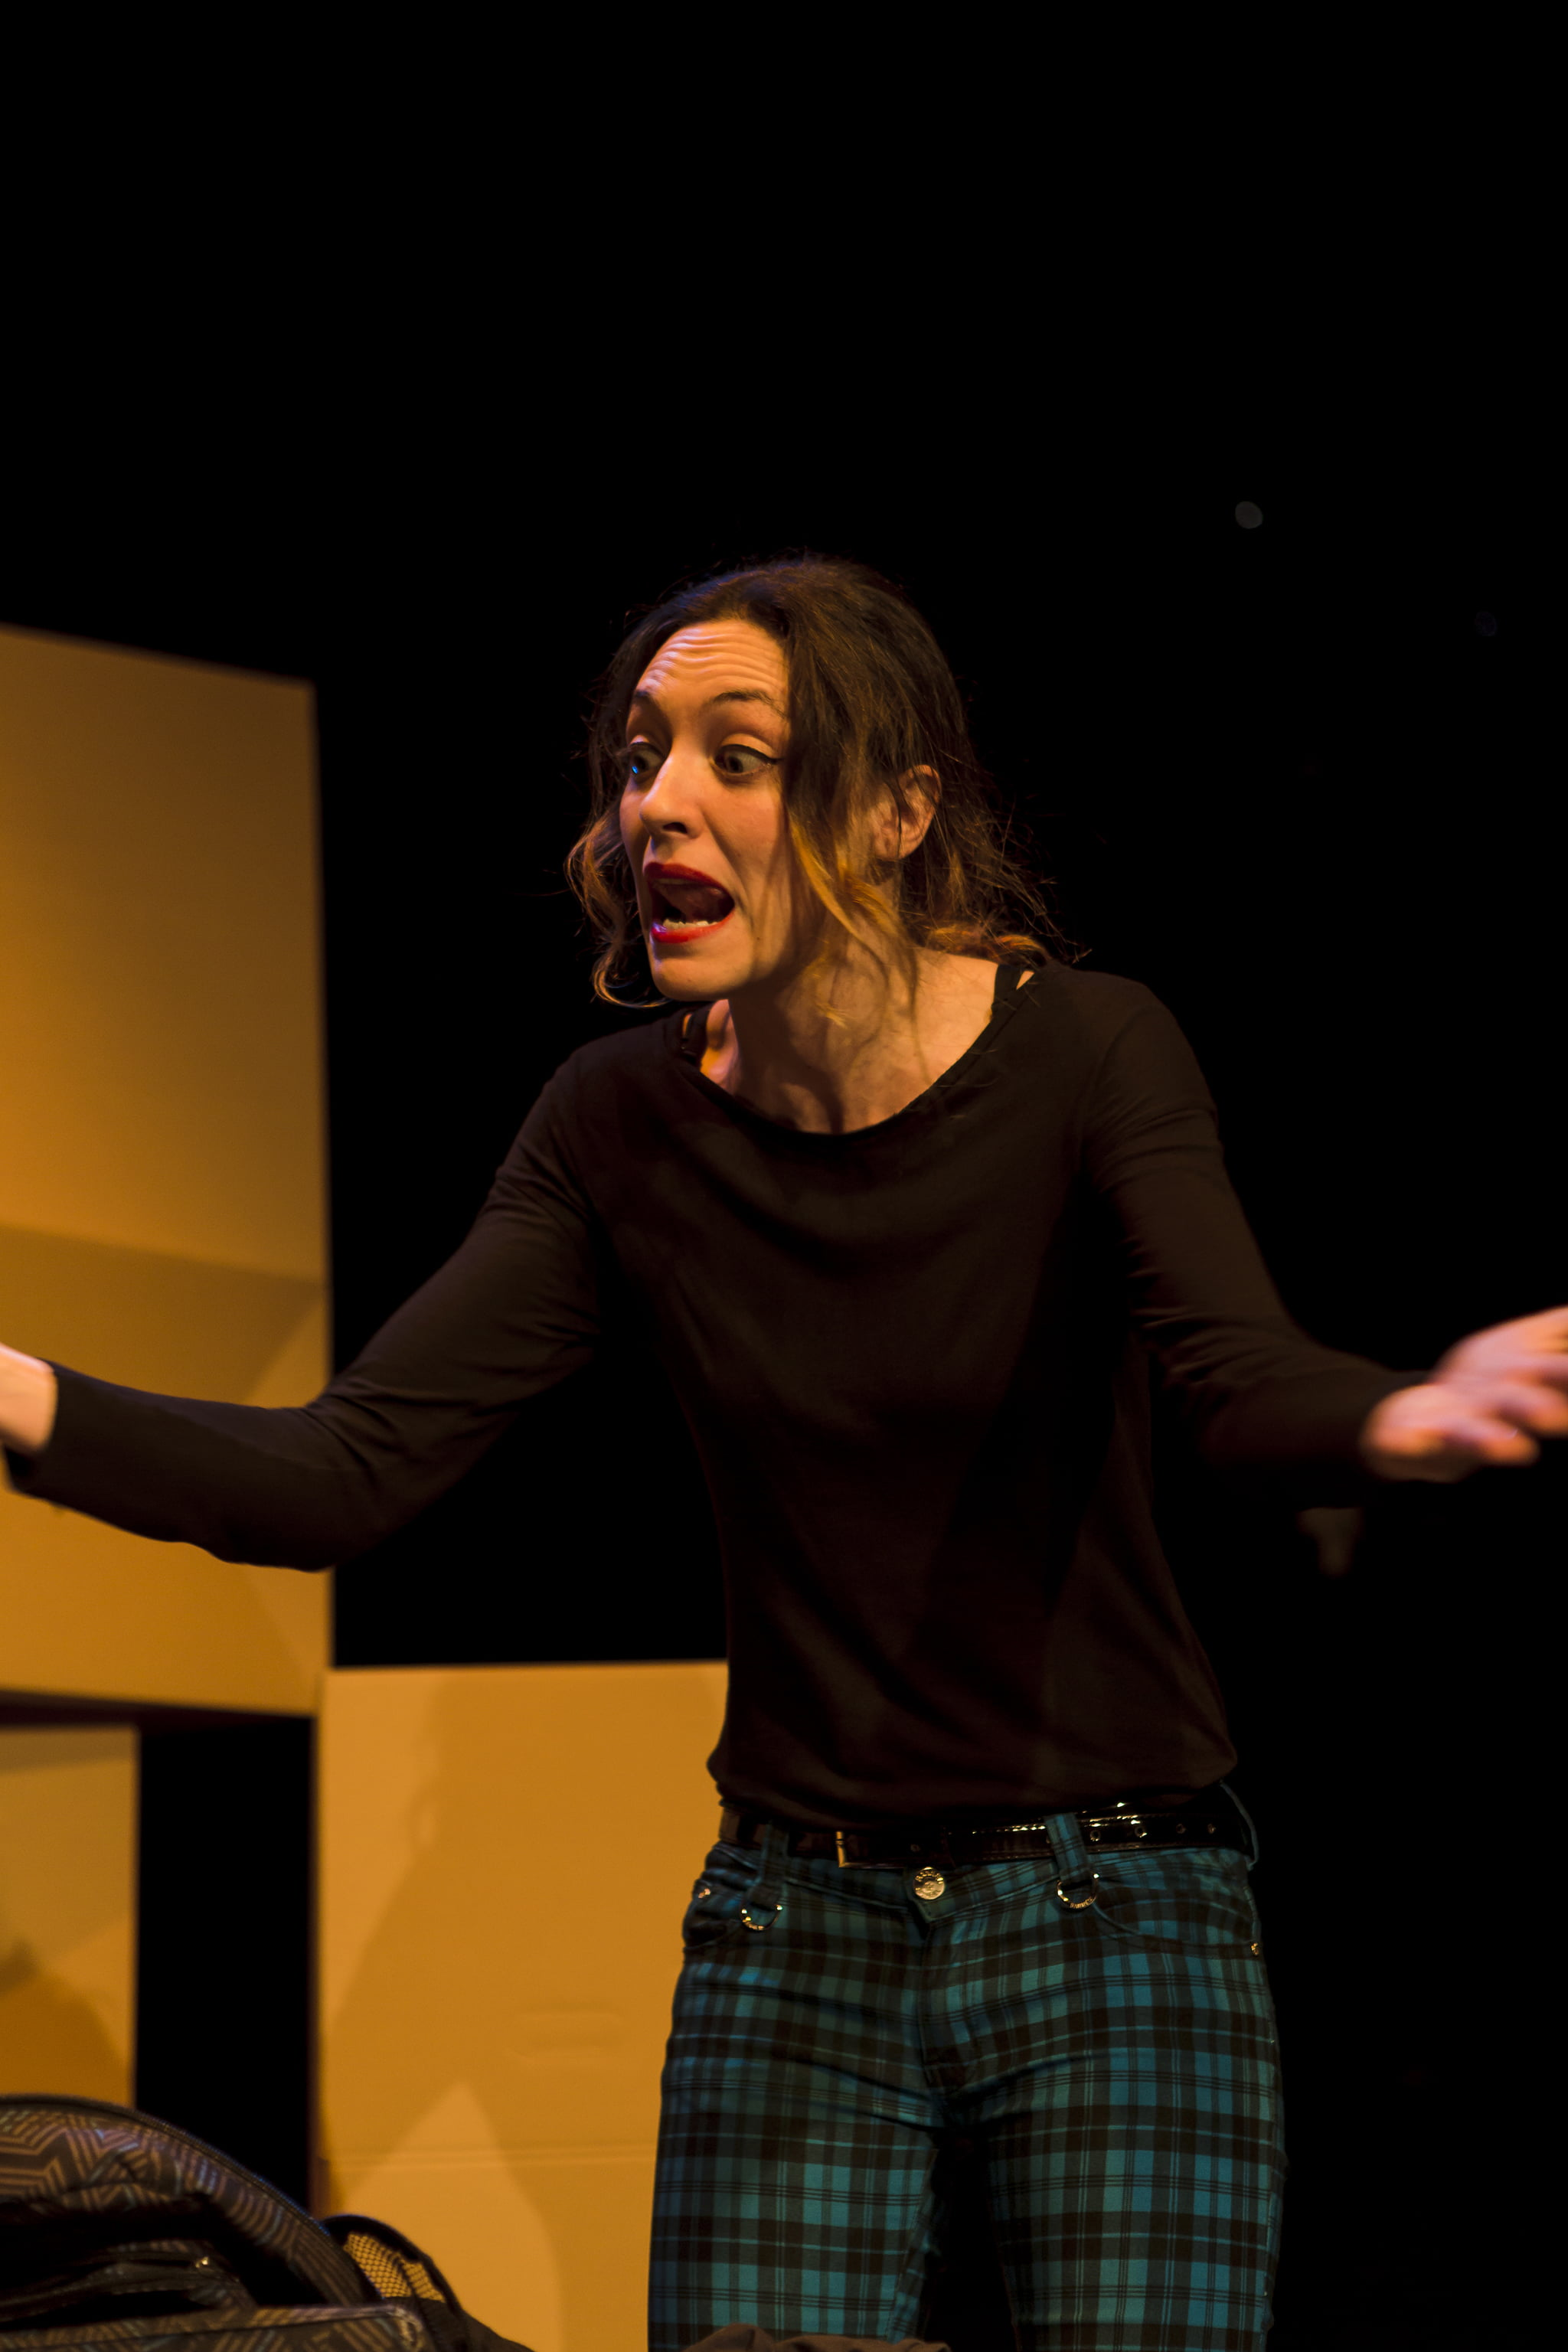 @Rita_Treator of Esclafit Teatre